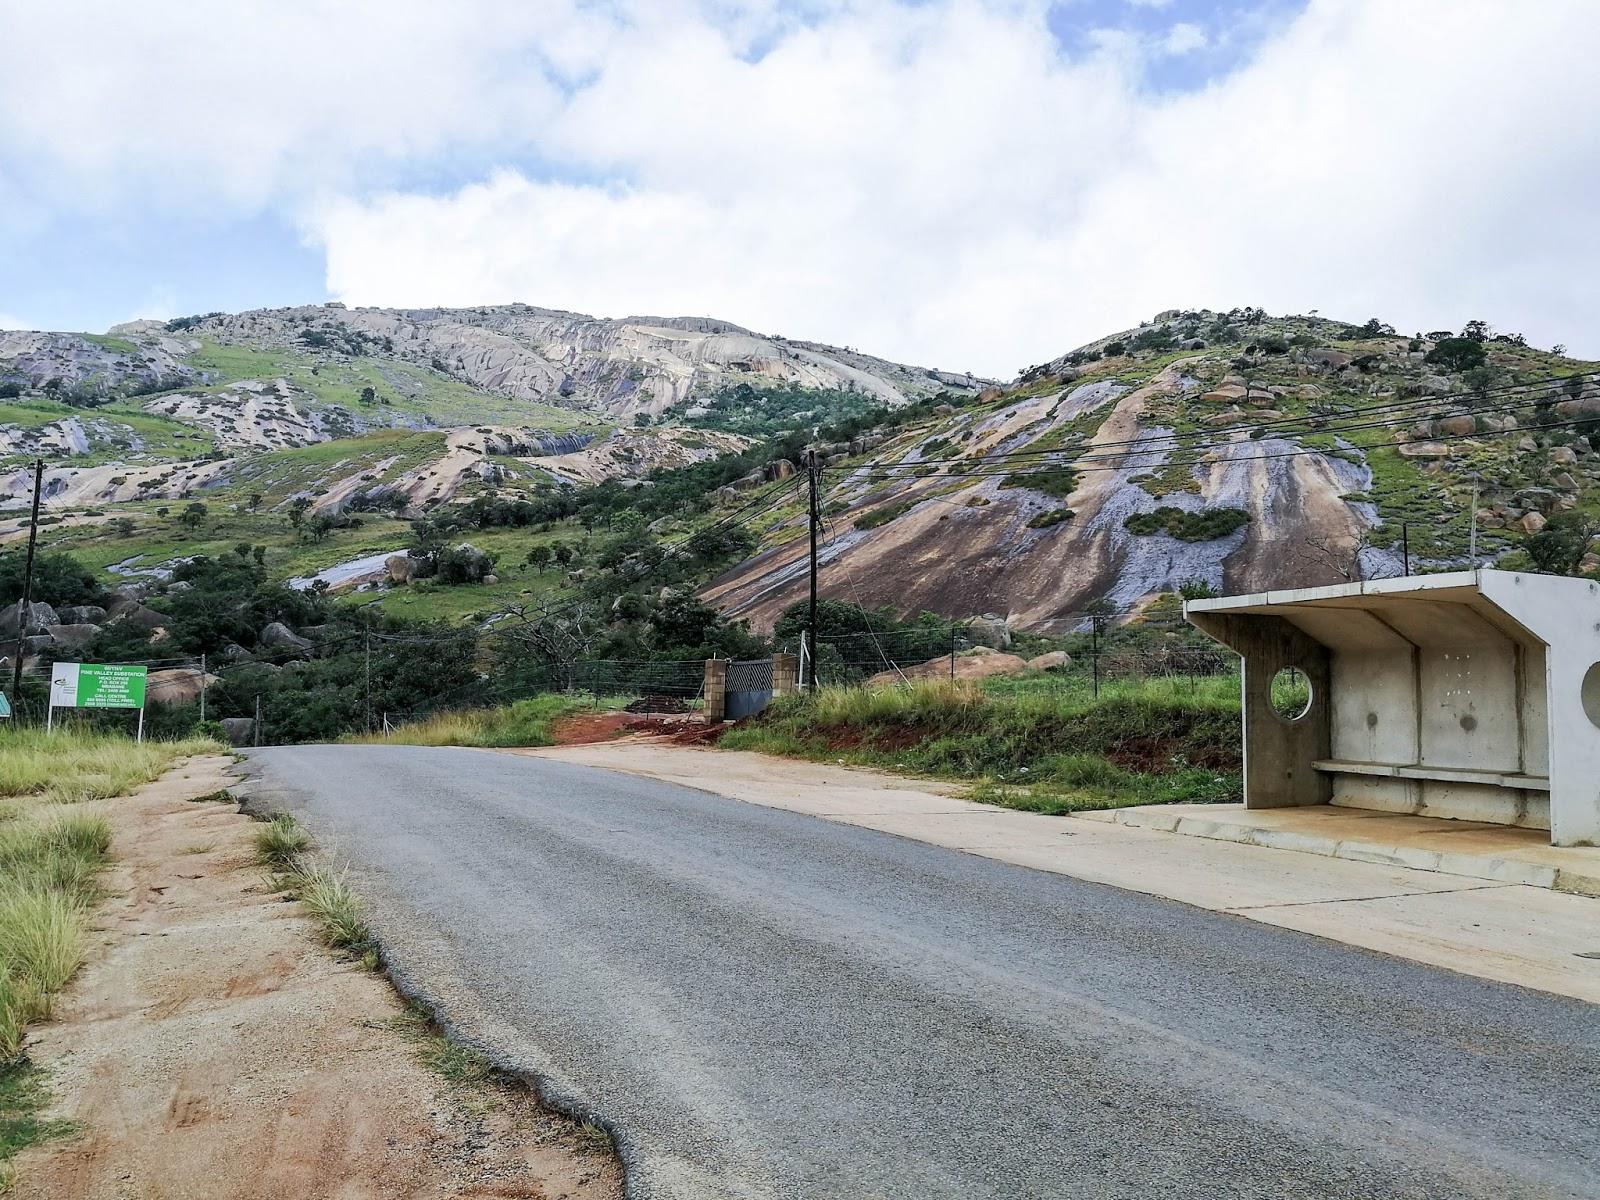 Malolotja, Mbabane, Sibebe, Swaziland, Swazimaa